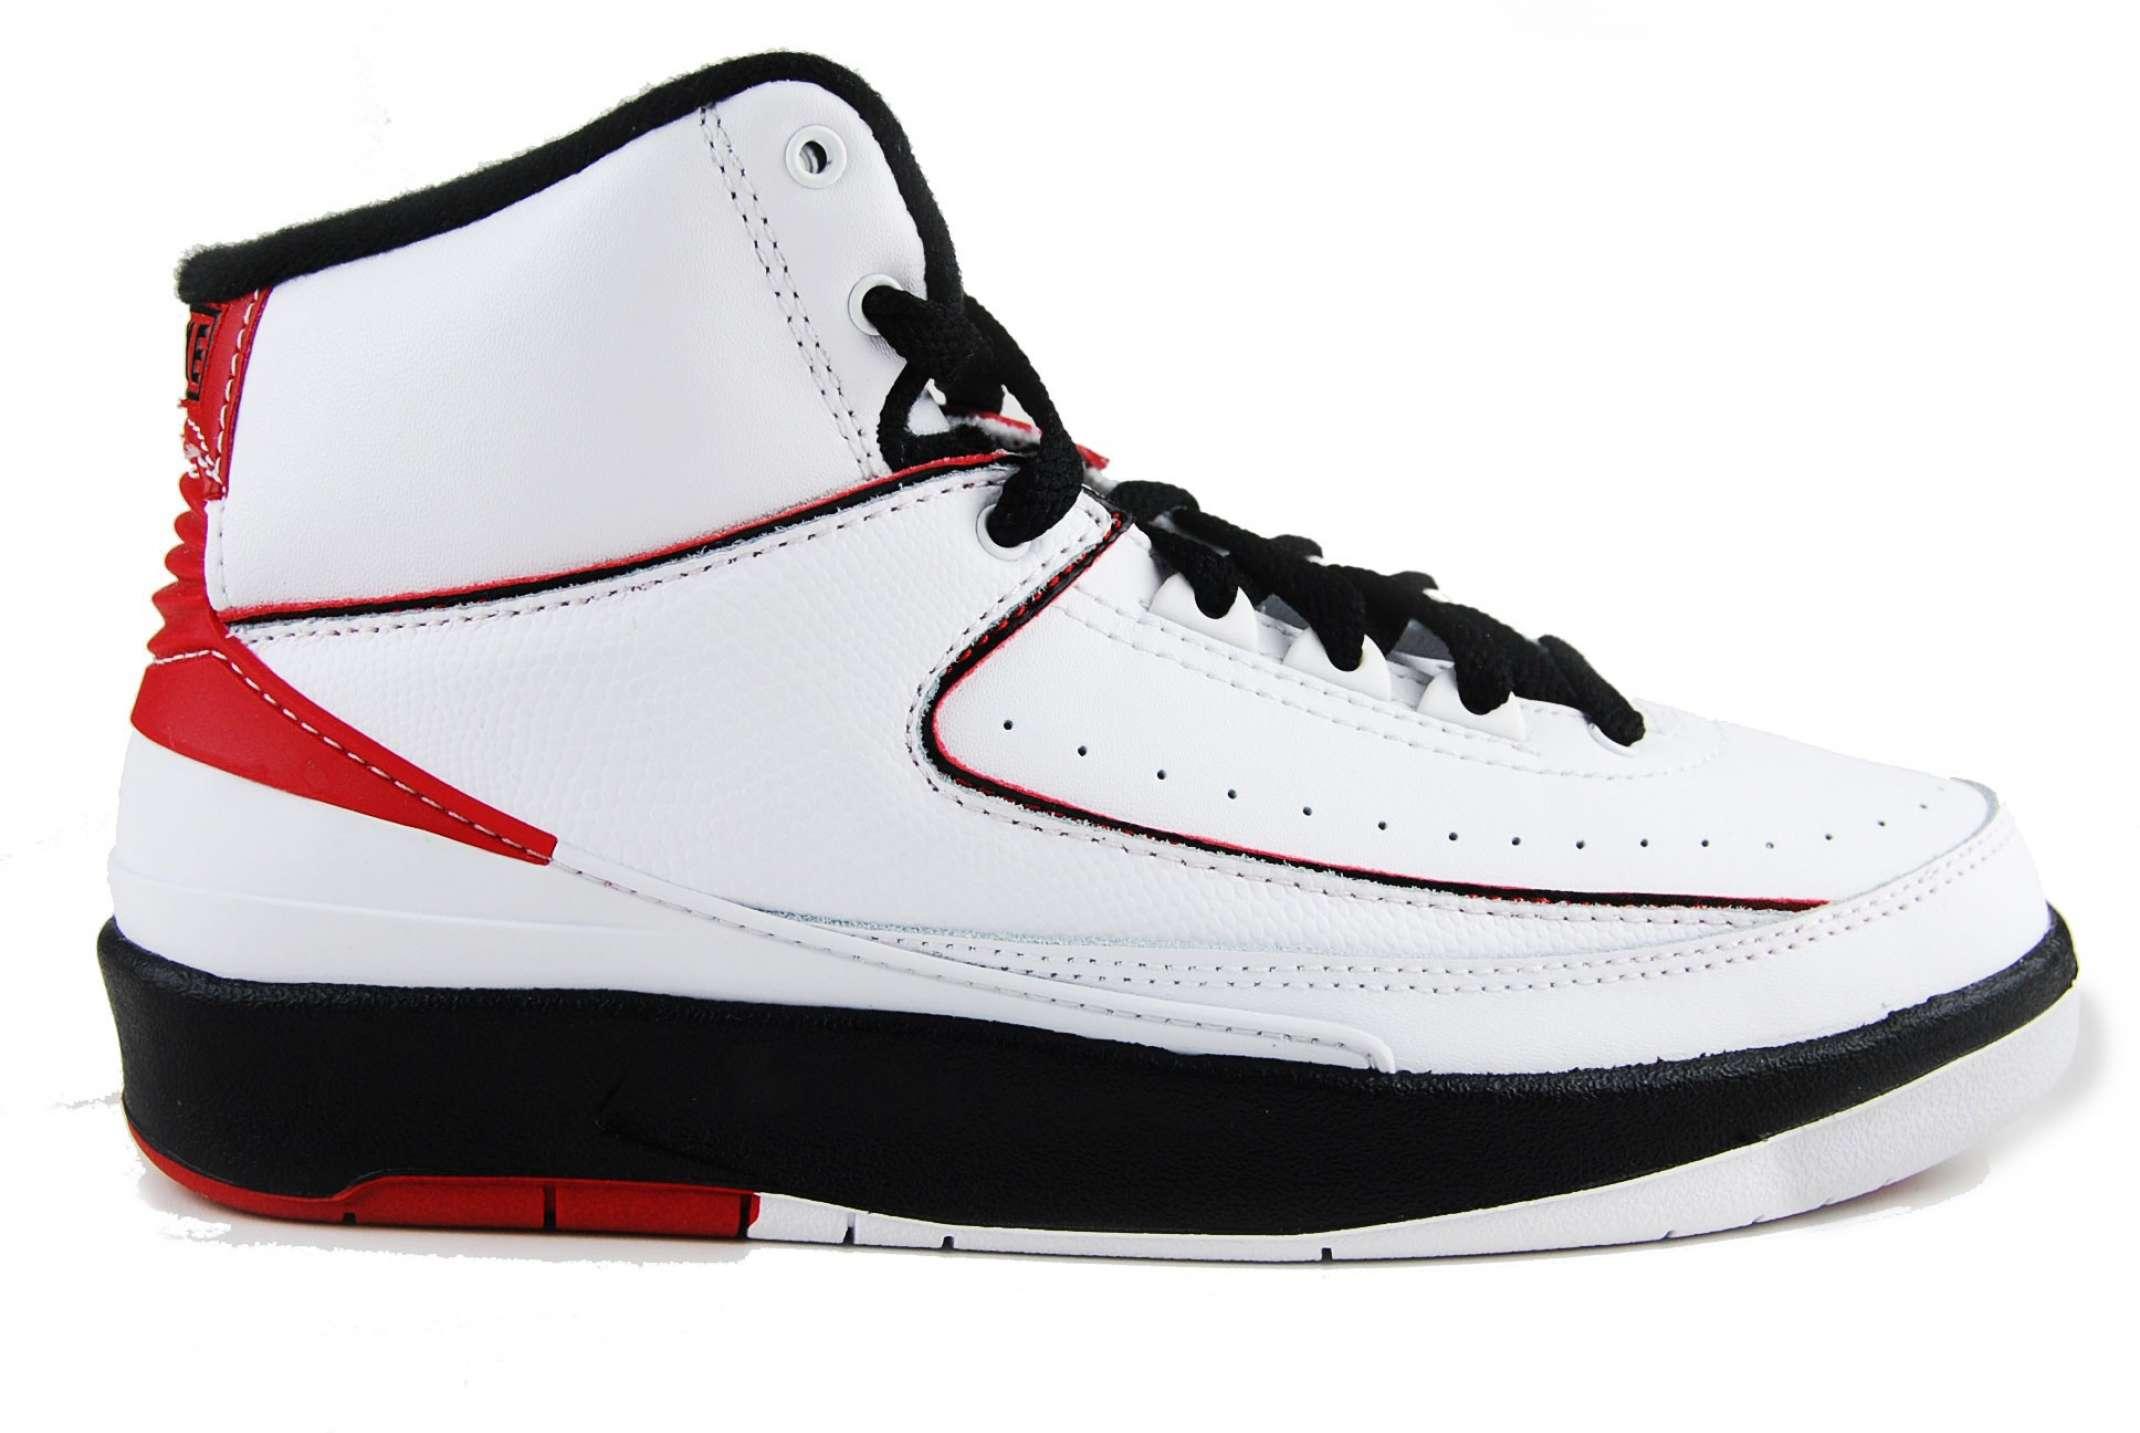 15ac1aebb1a Seduced by Sneakers again!